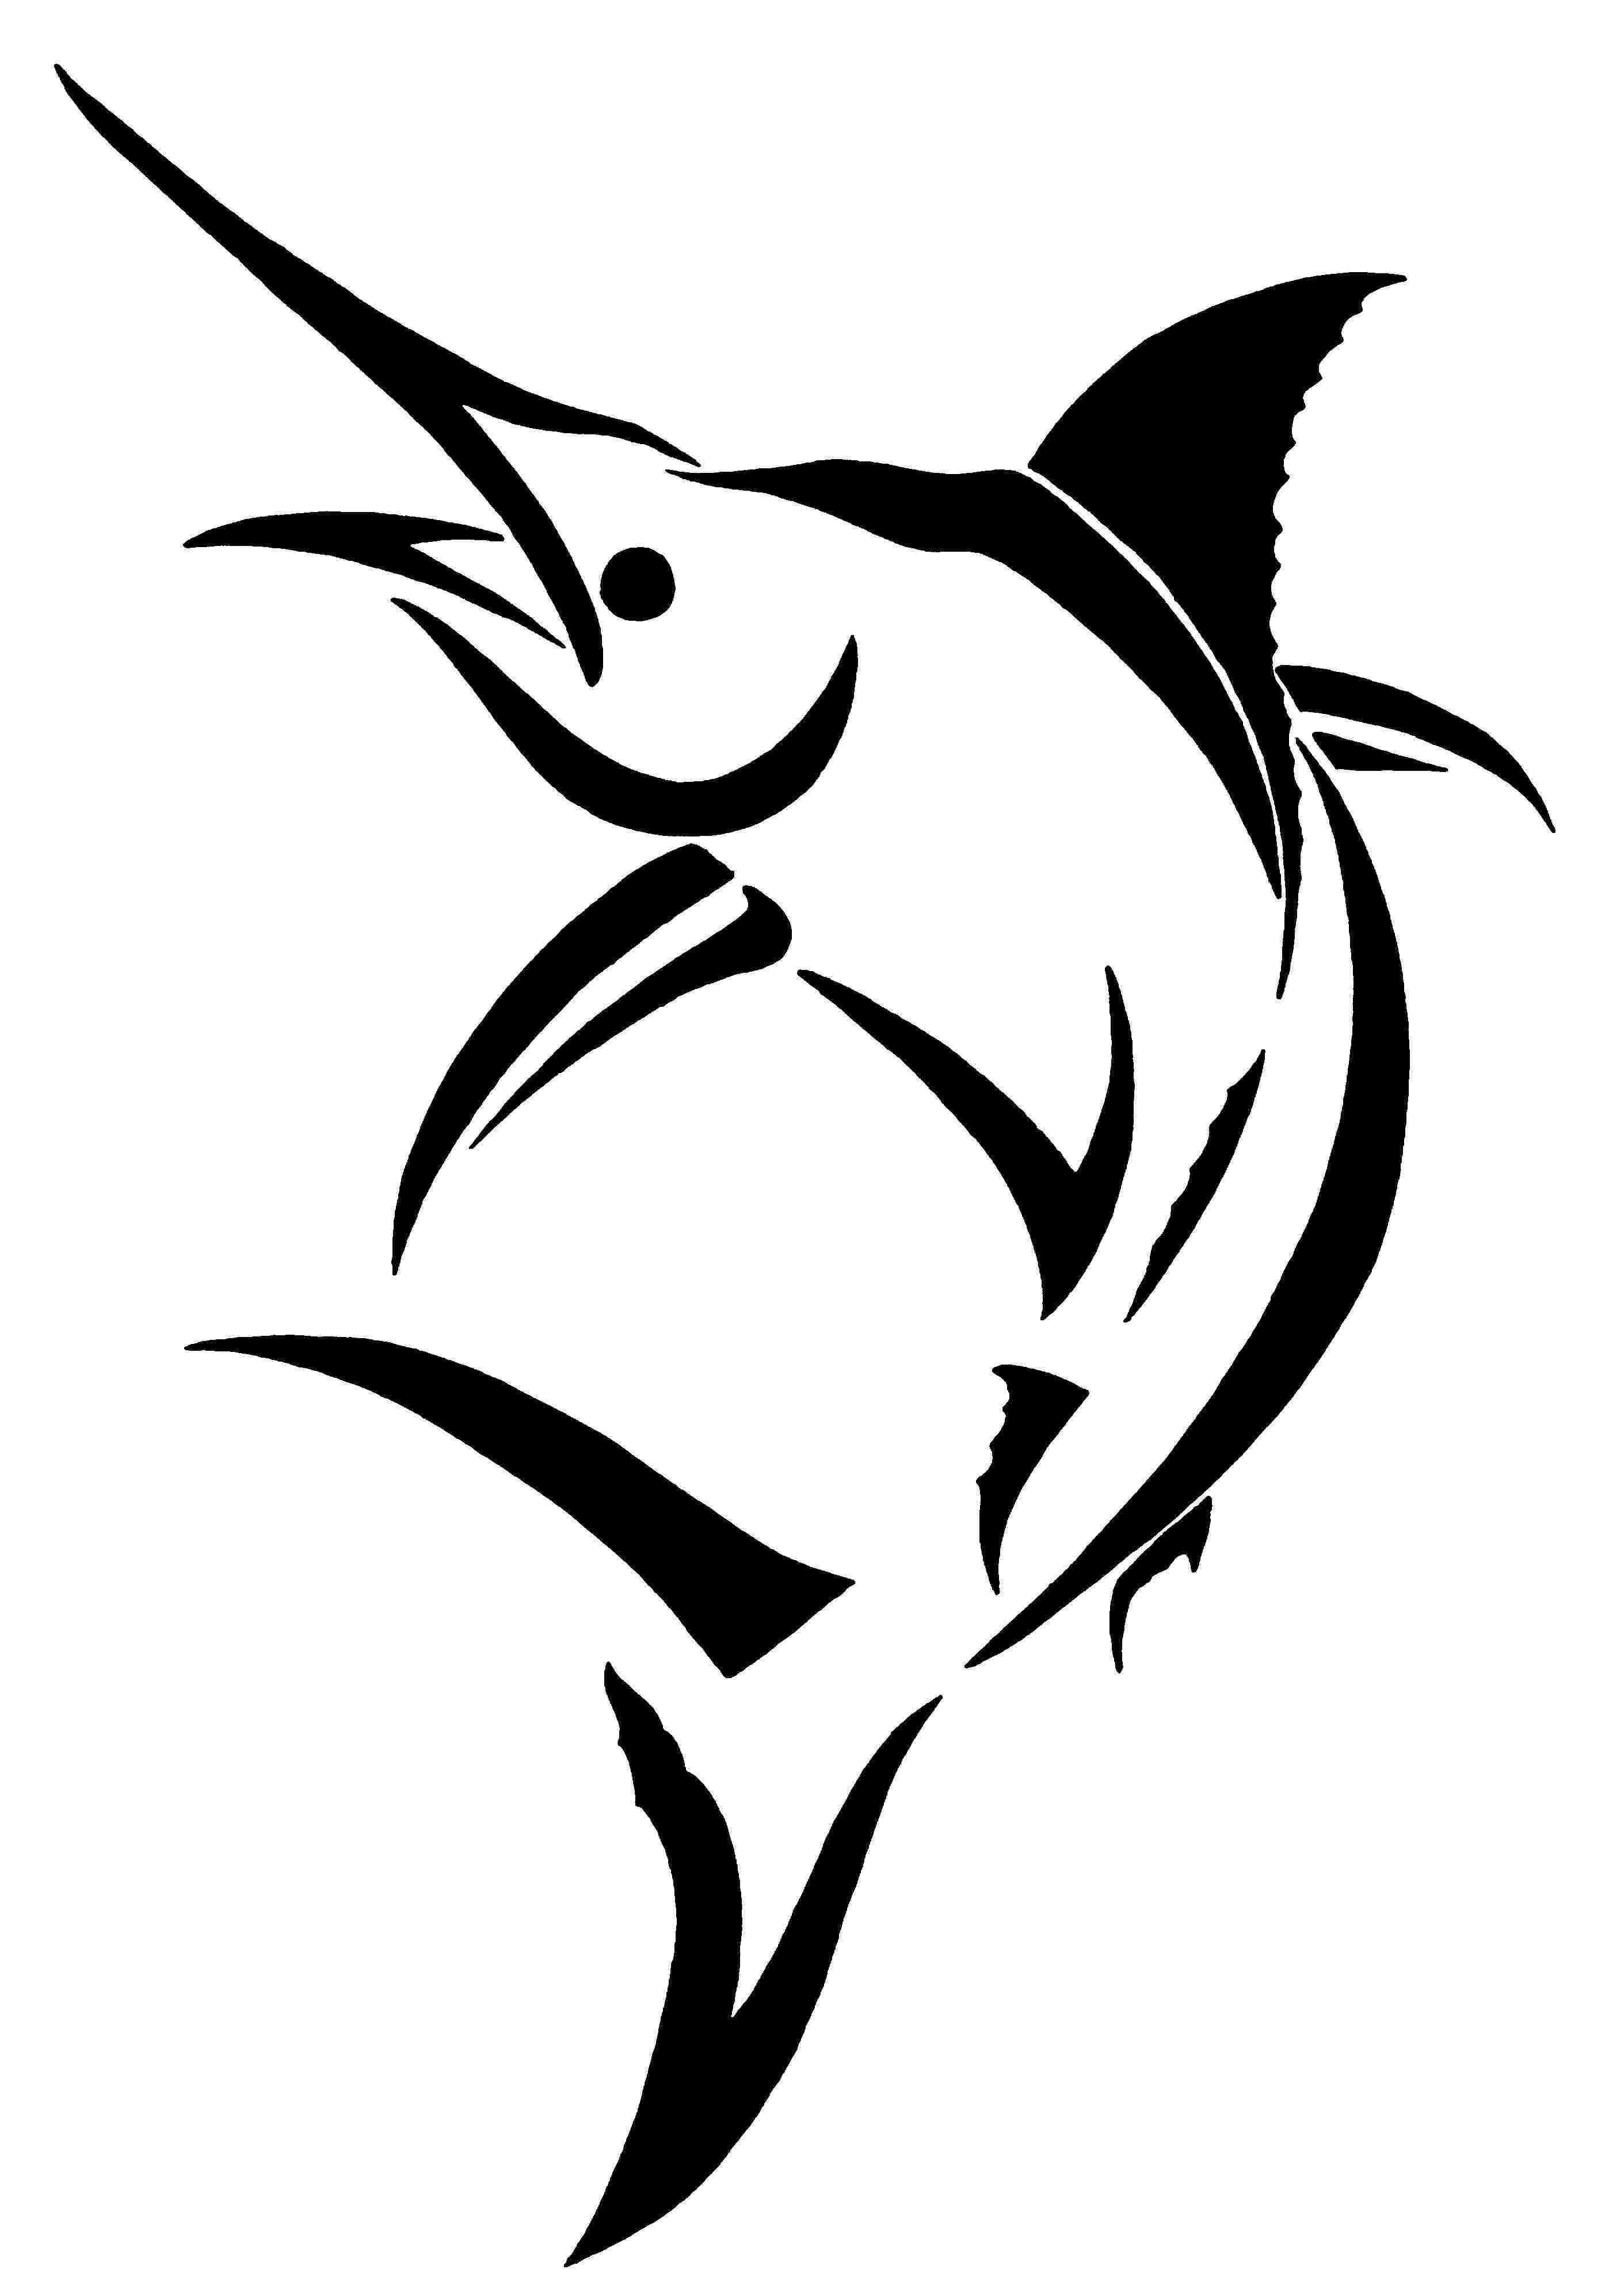 Swordfish clipart cartoon Clipart Panda Free Clipart Images